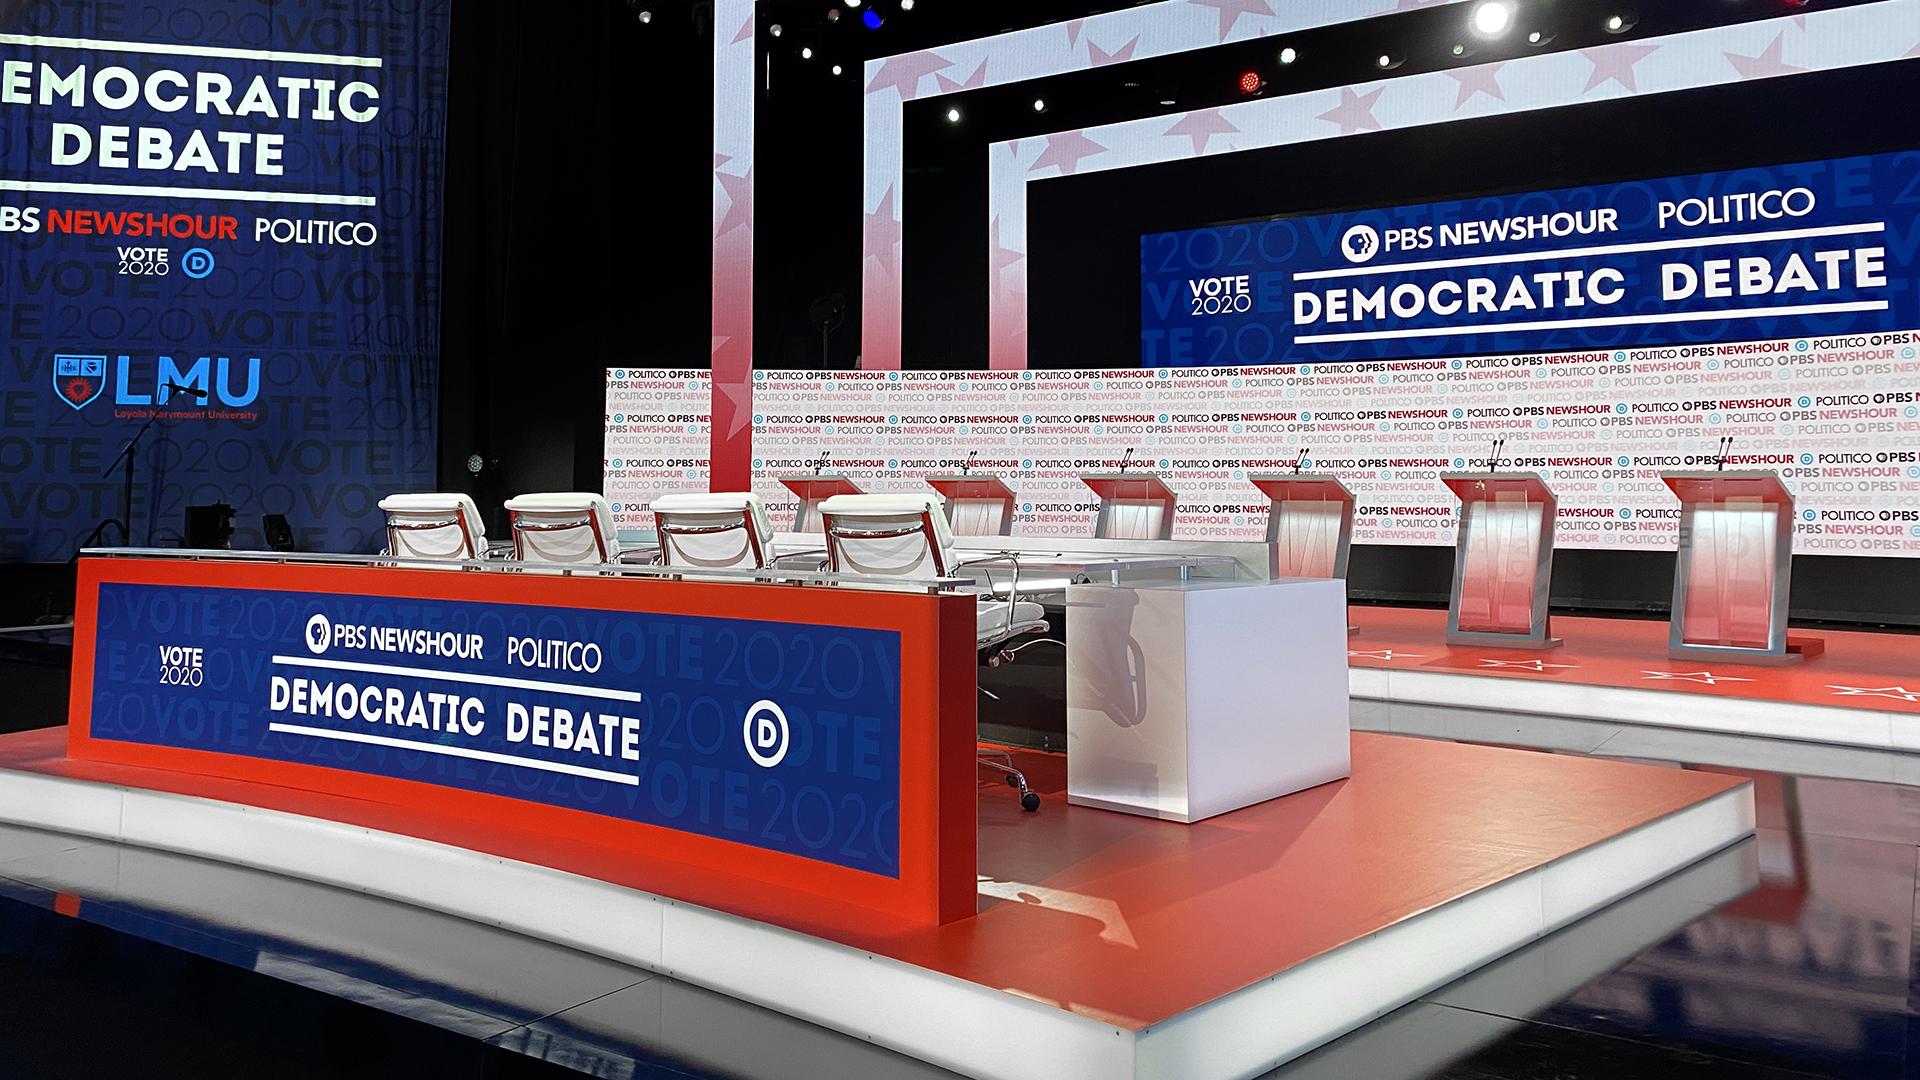 NCS_PBS-NewsHour_Politico_Democratic-Debate_015